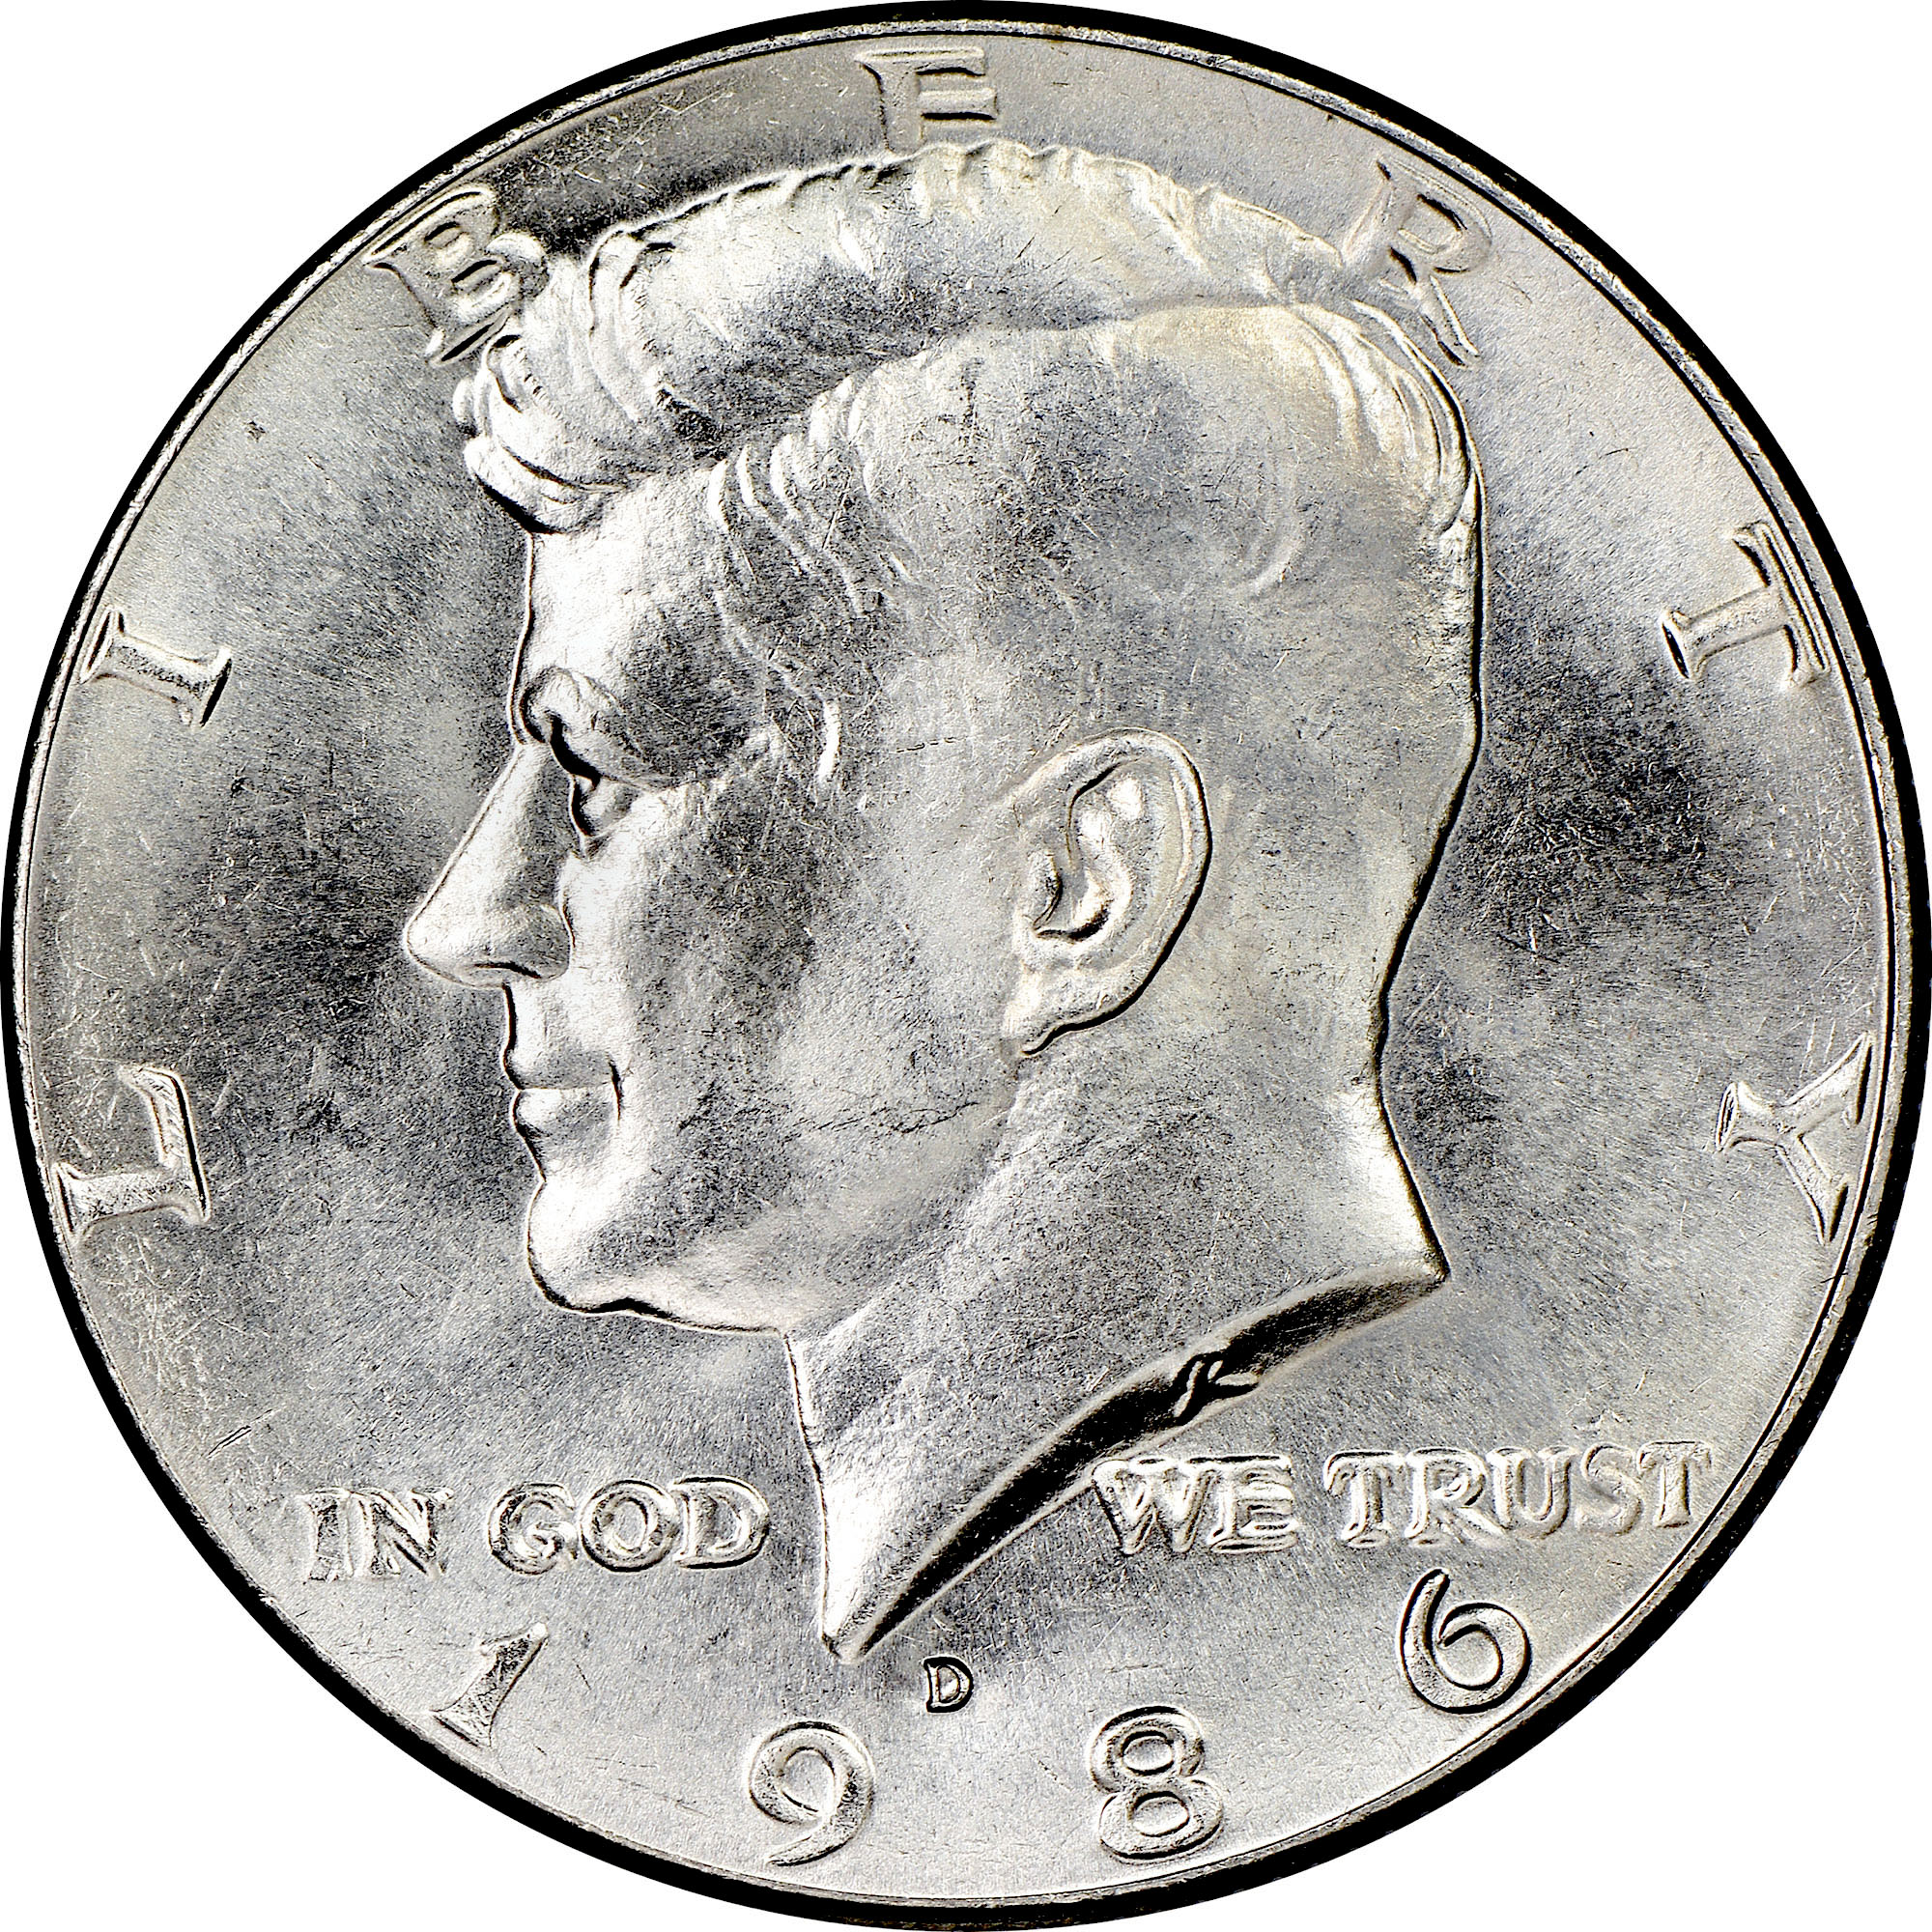 Circulated but Nice ! 1986-D Kennedy Half Dollar